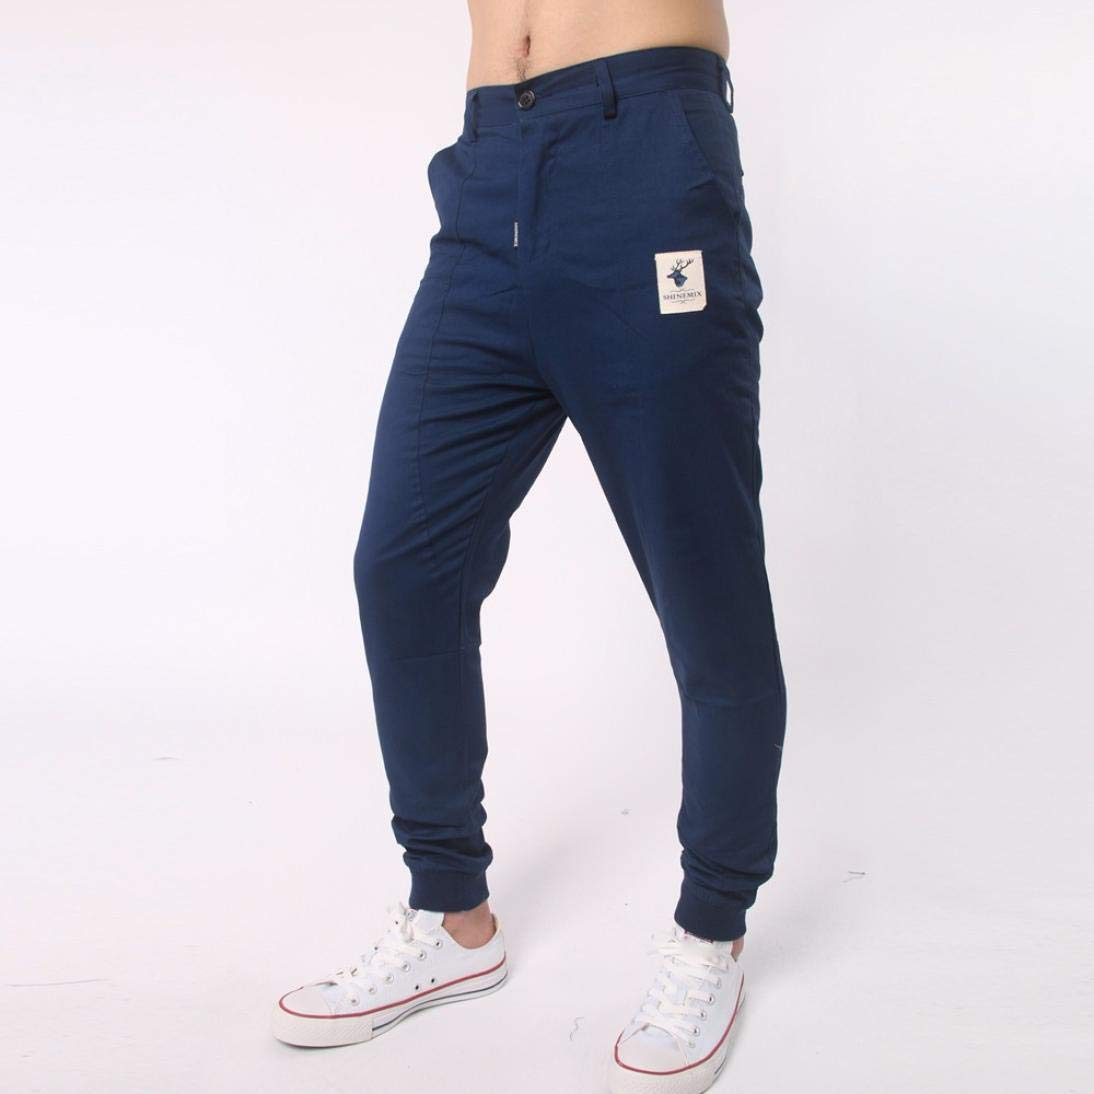 Willsa Mens Pants Trousers Harem Sweatpants Slacks Casual Jogger Sportwear Baggy Comfy Pant